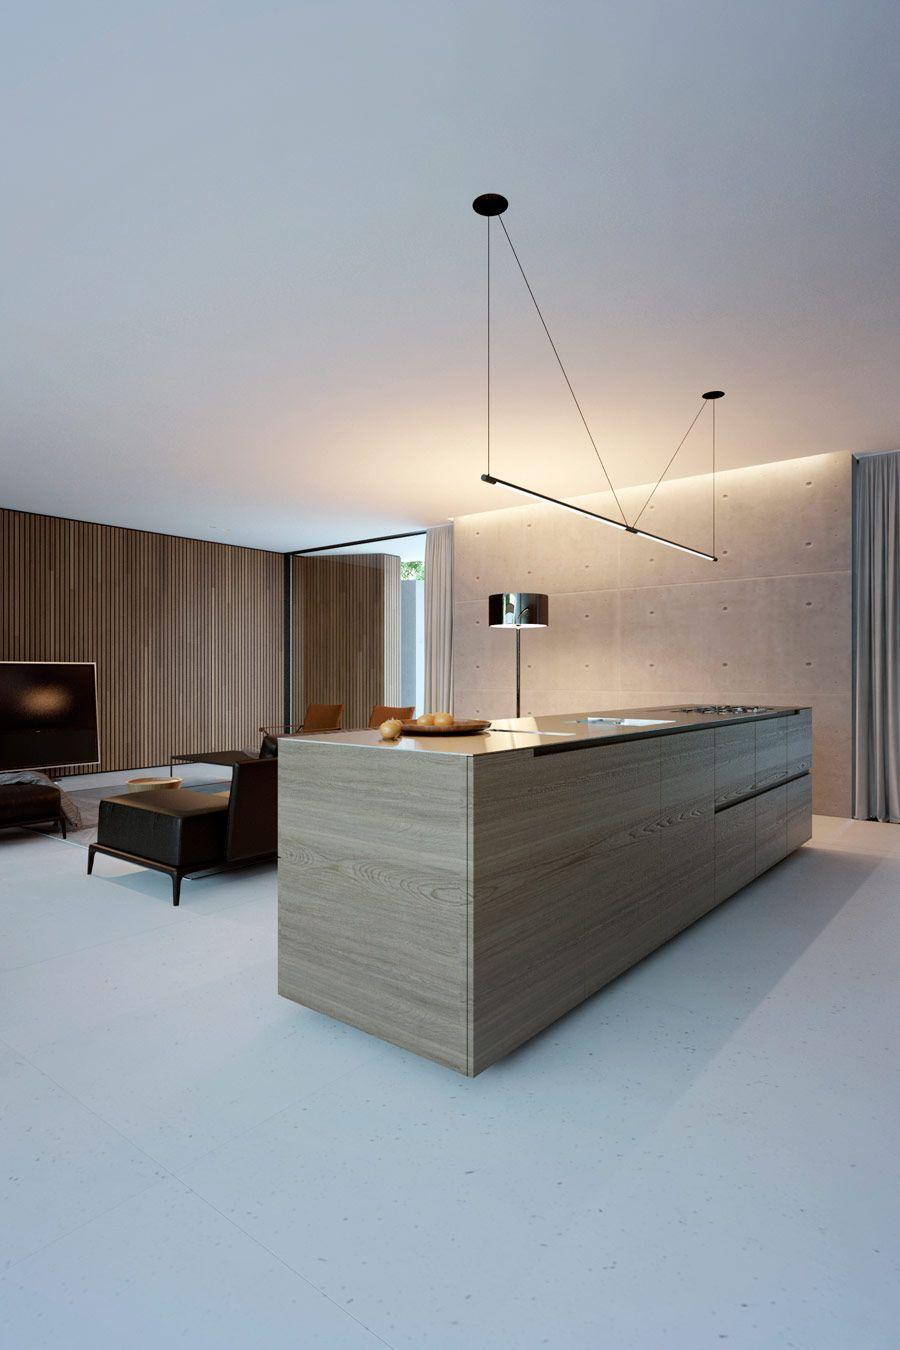 piano house by line architects pinterest k che innenarchitektur und neubau. Black Bedroom Furniture Sets. Home Design Ideas